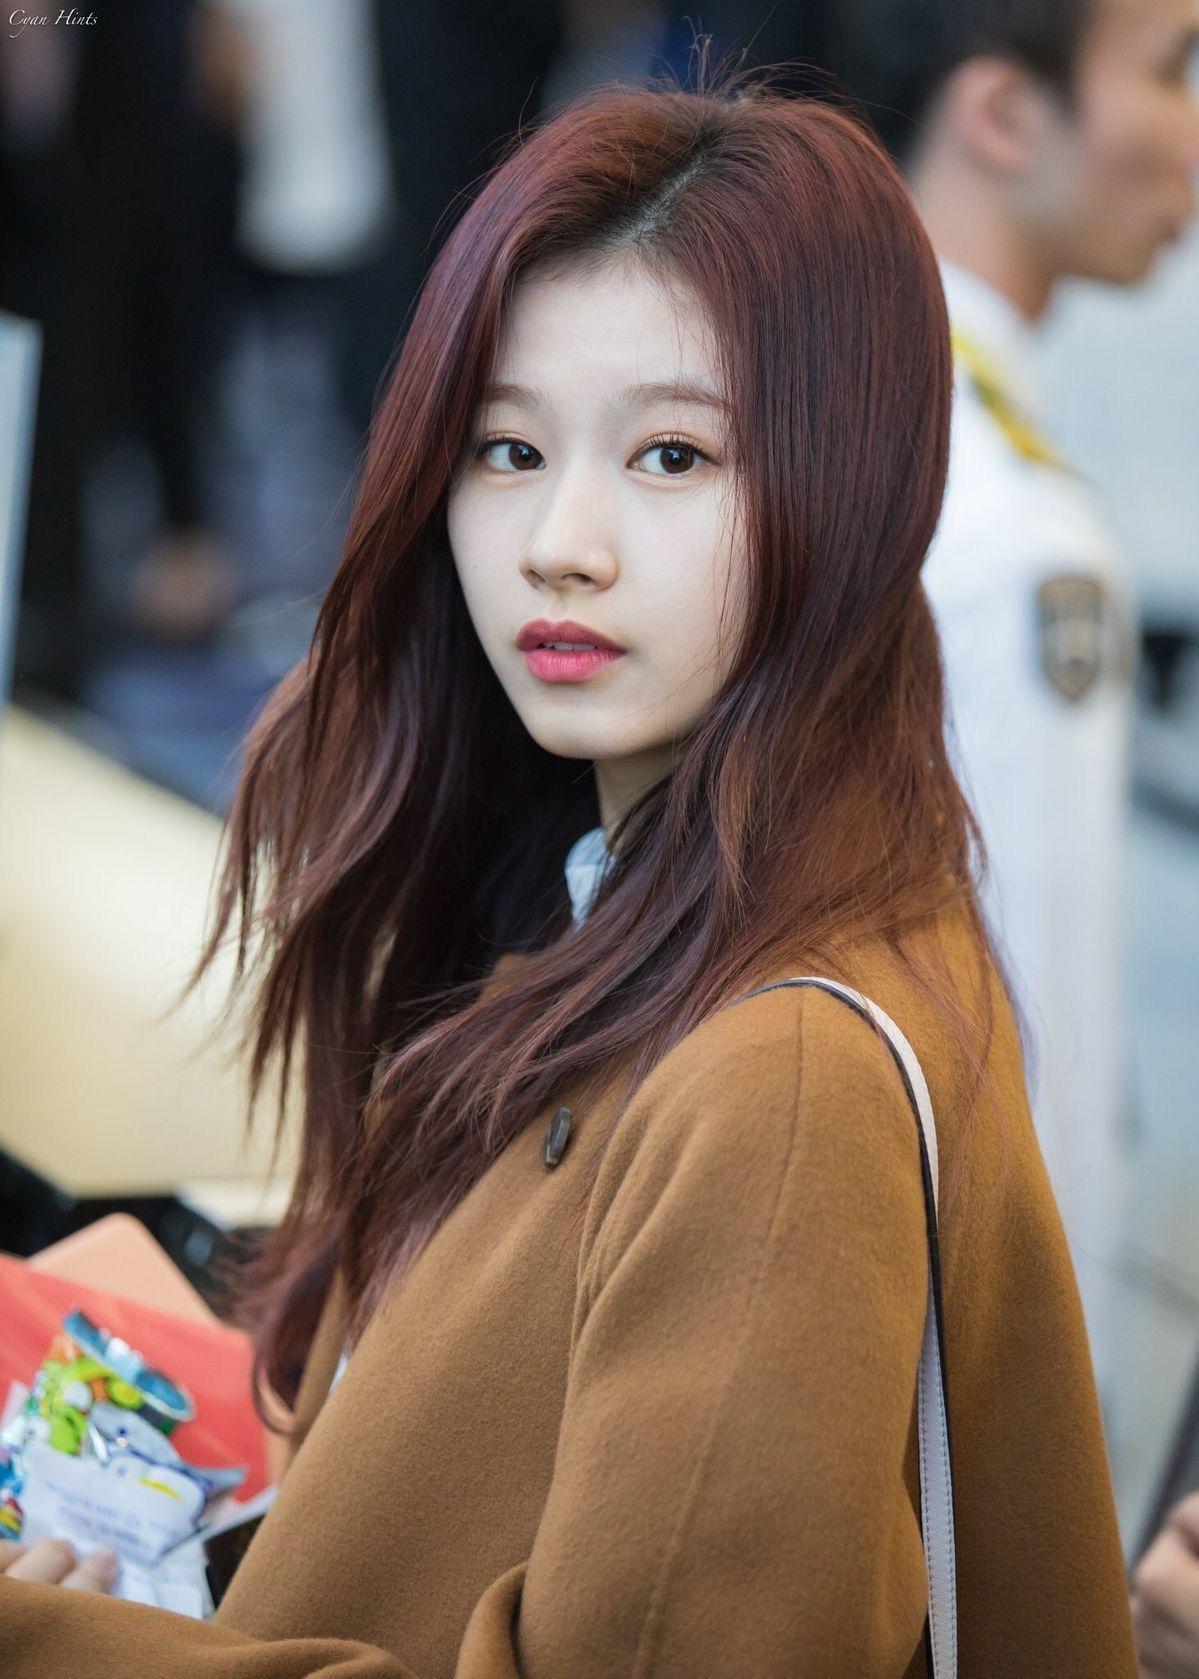 Pin de ♡ k i m ♡ en ᵀᵂᴵᶜᴱ Sana, Idols coreanos, Momo